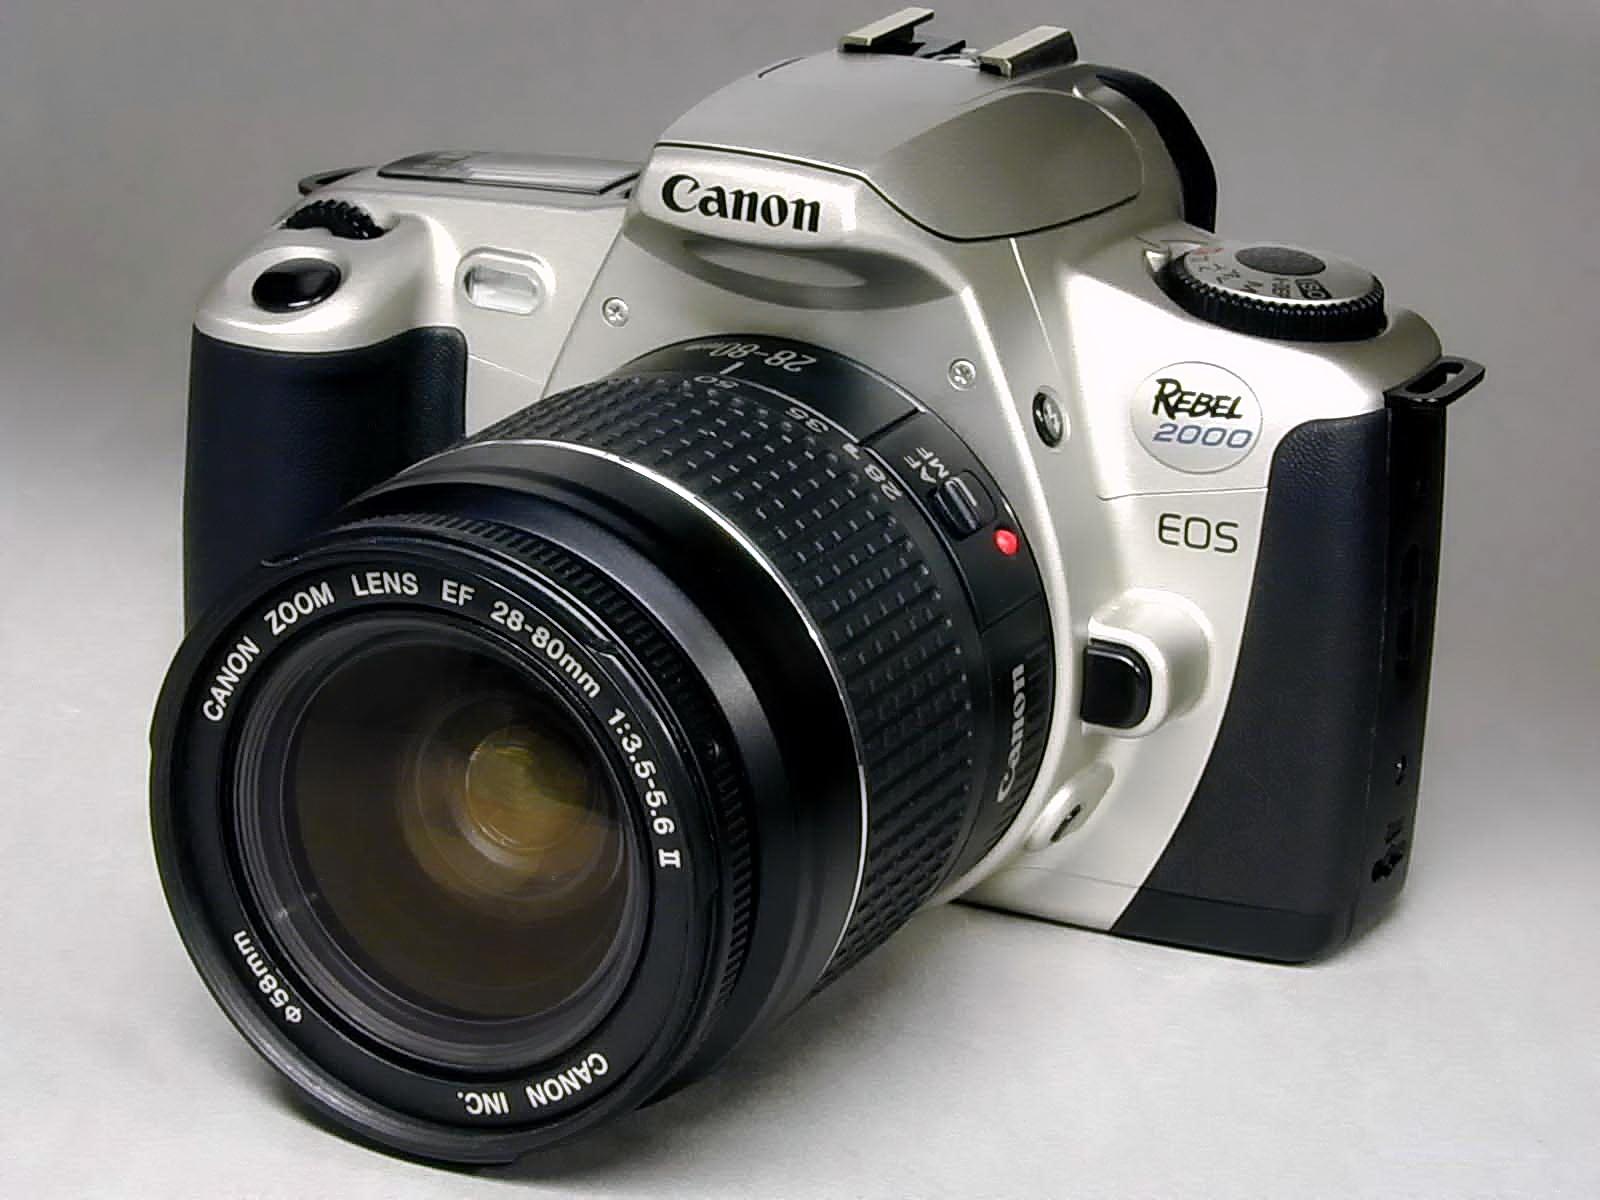 Canon EOS 450D / Digital Rebel XSi - DPReview